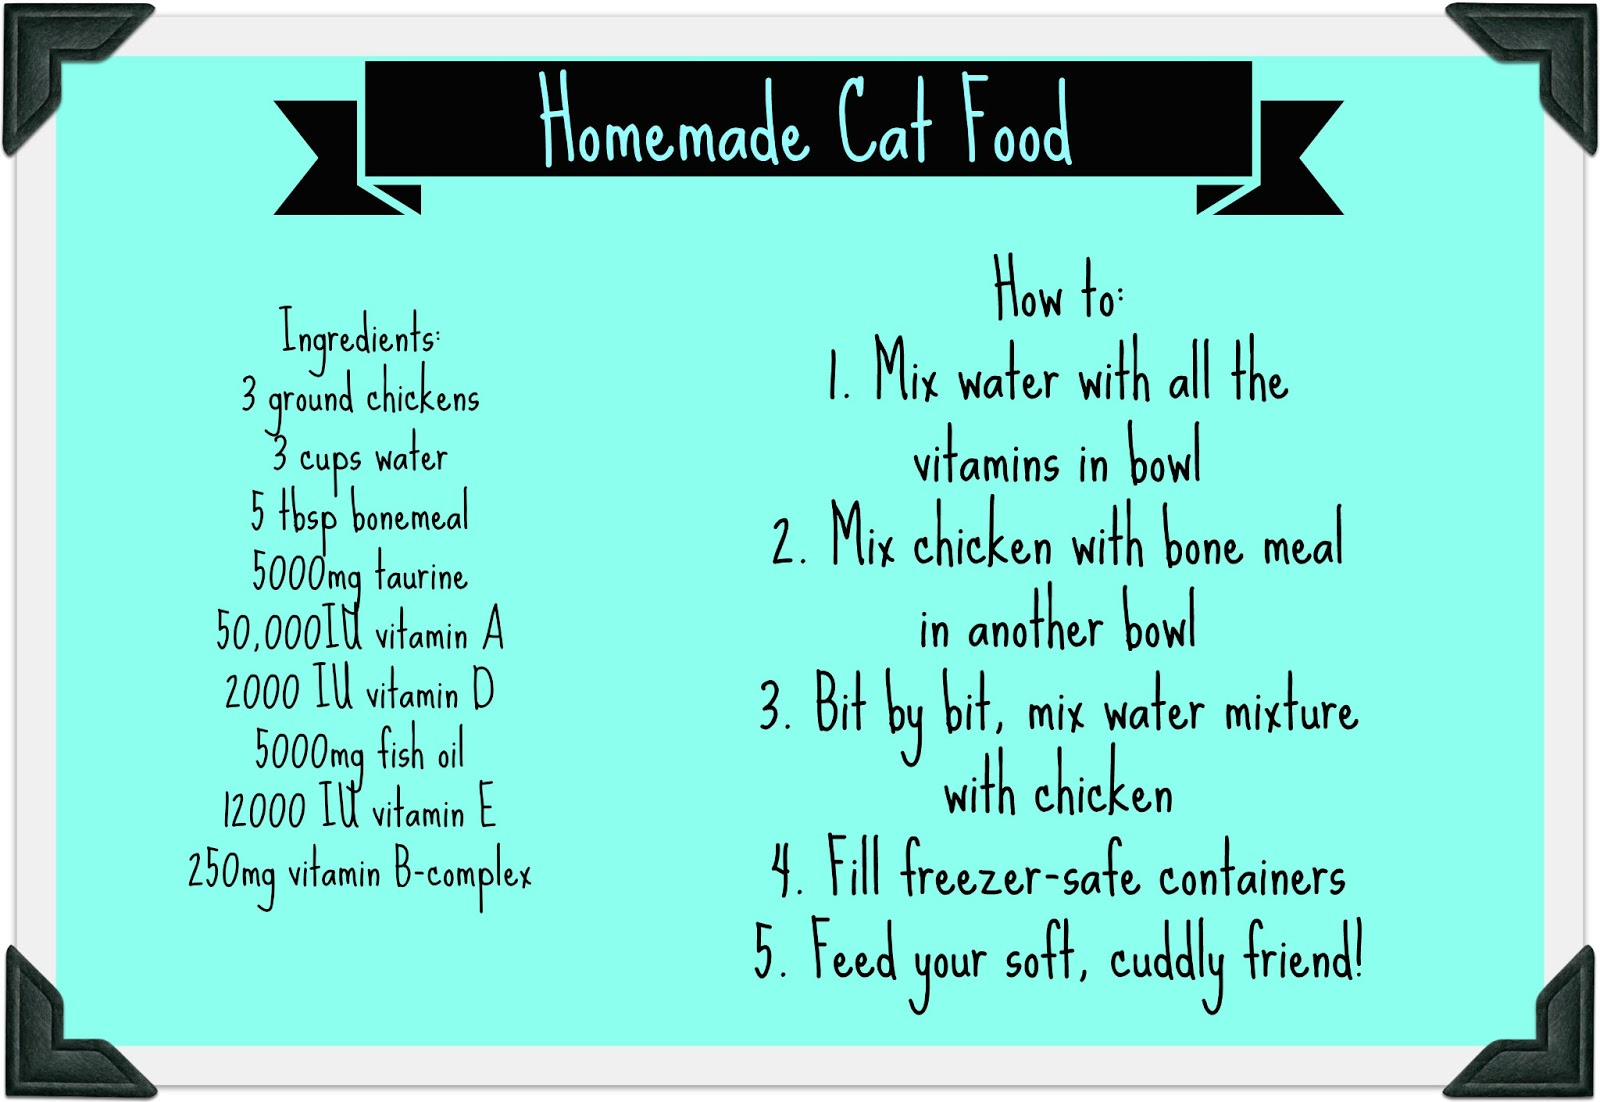 Food recipe homemade cat food recipe images of homemade cat food recipe forumfinder Images